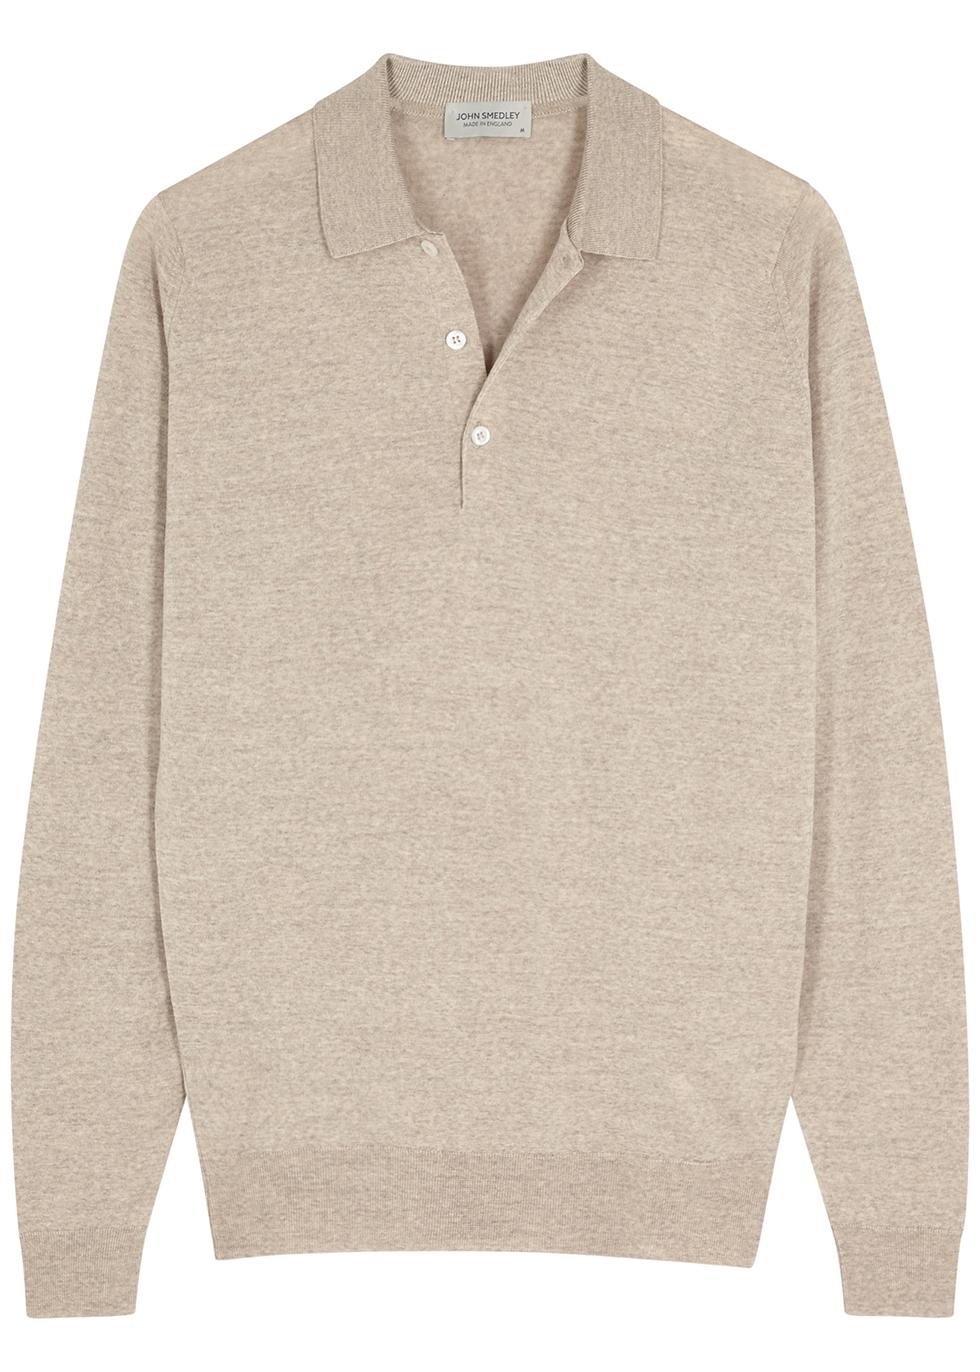 Belper oatmeal merino wool polo shirt